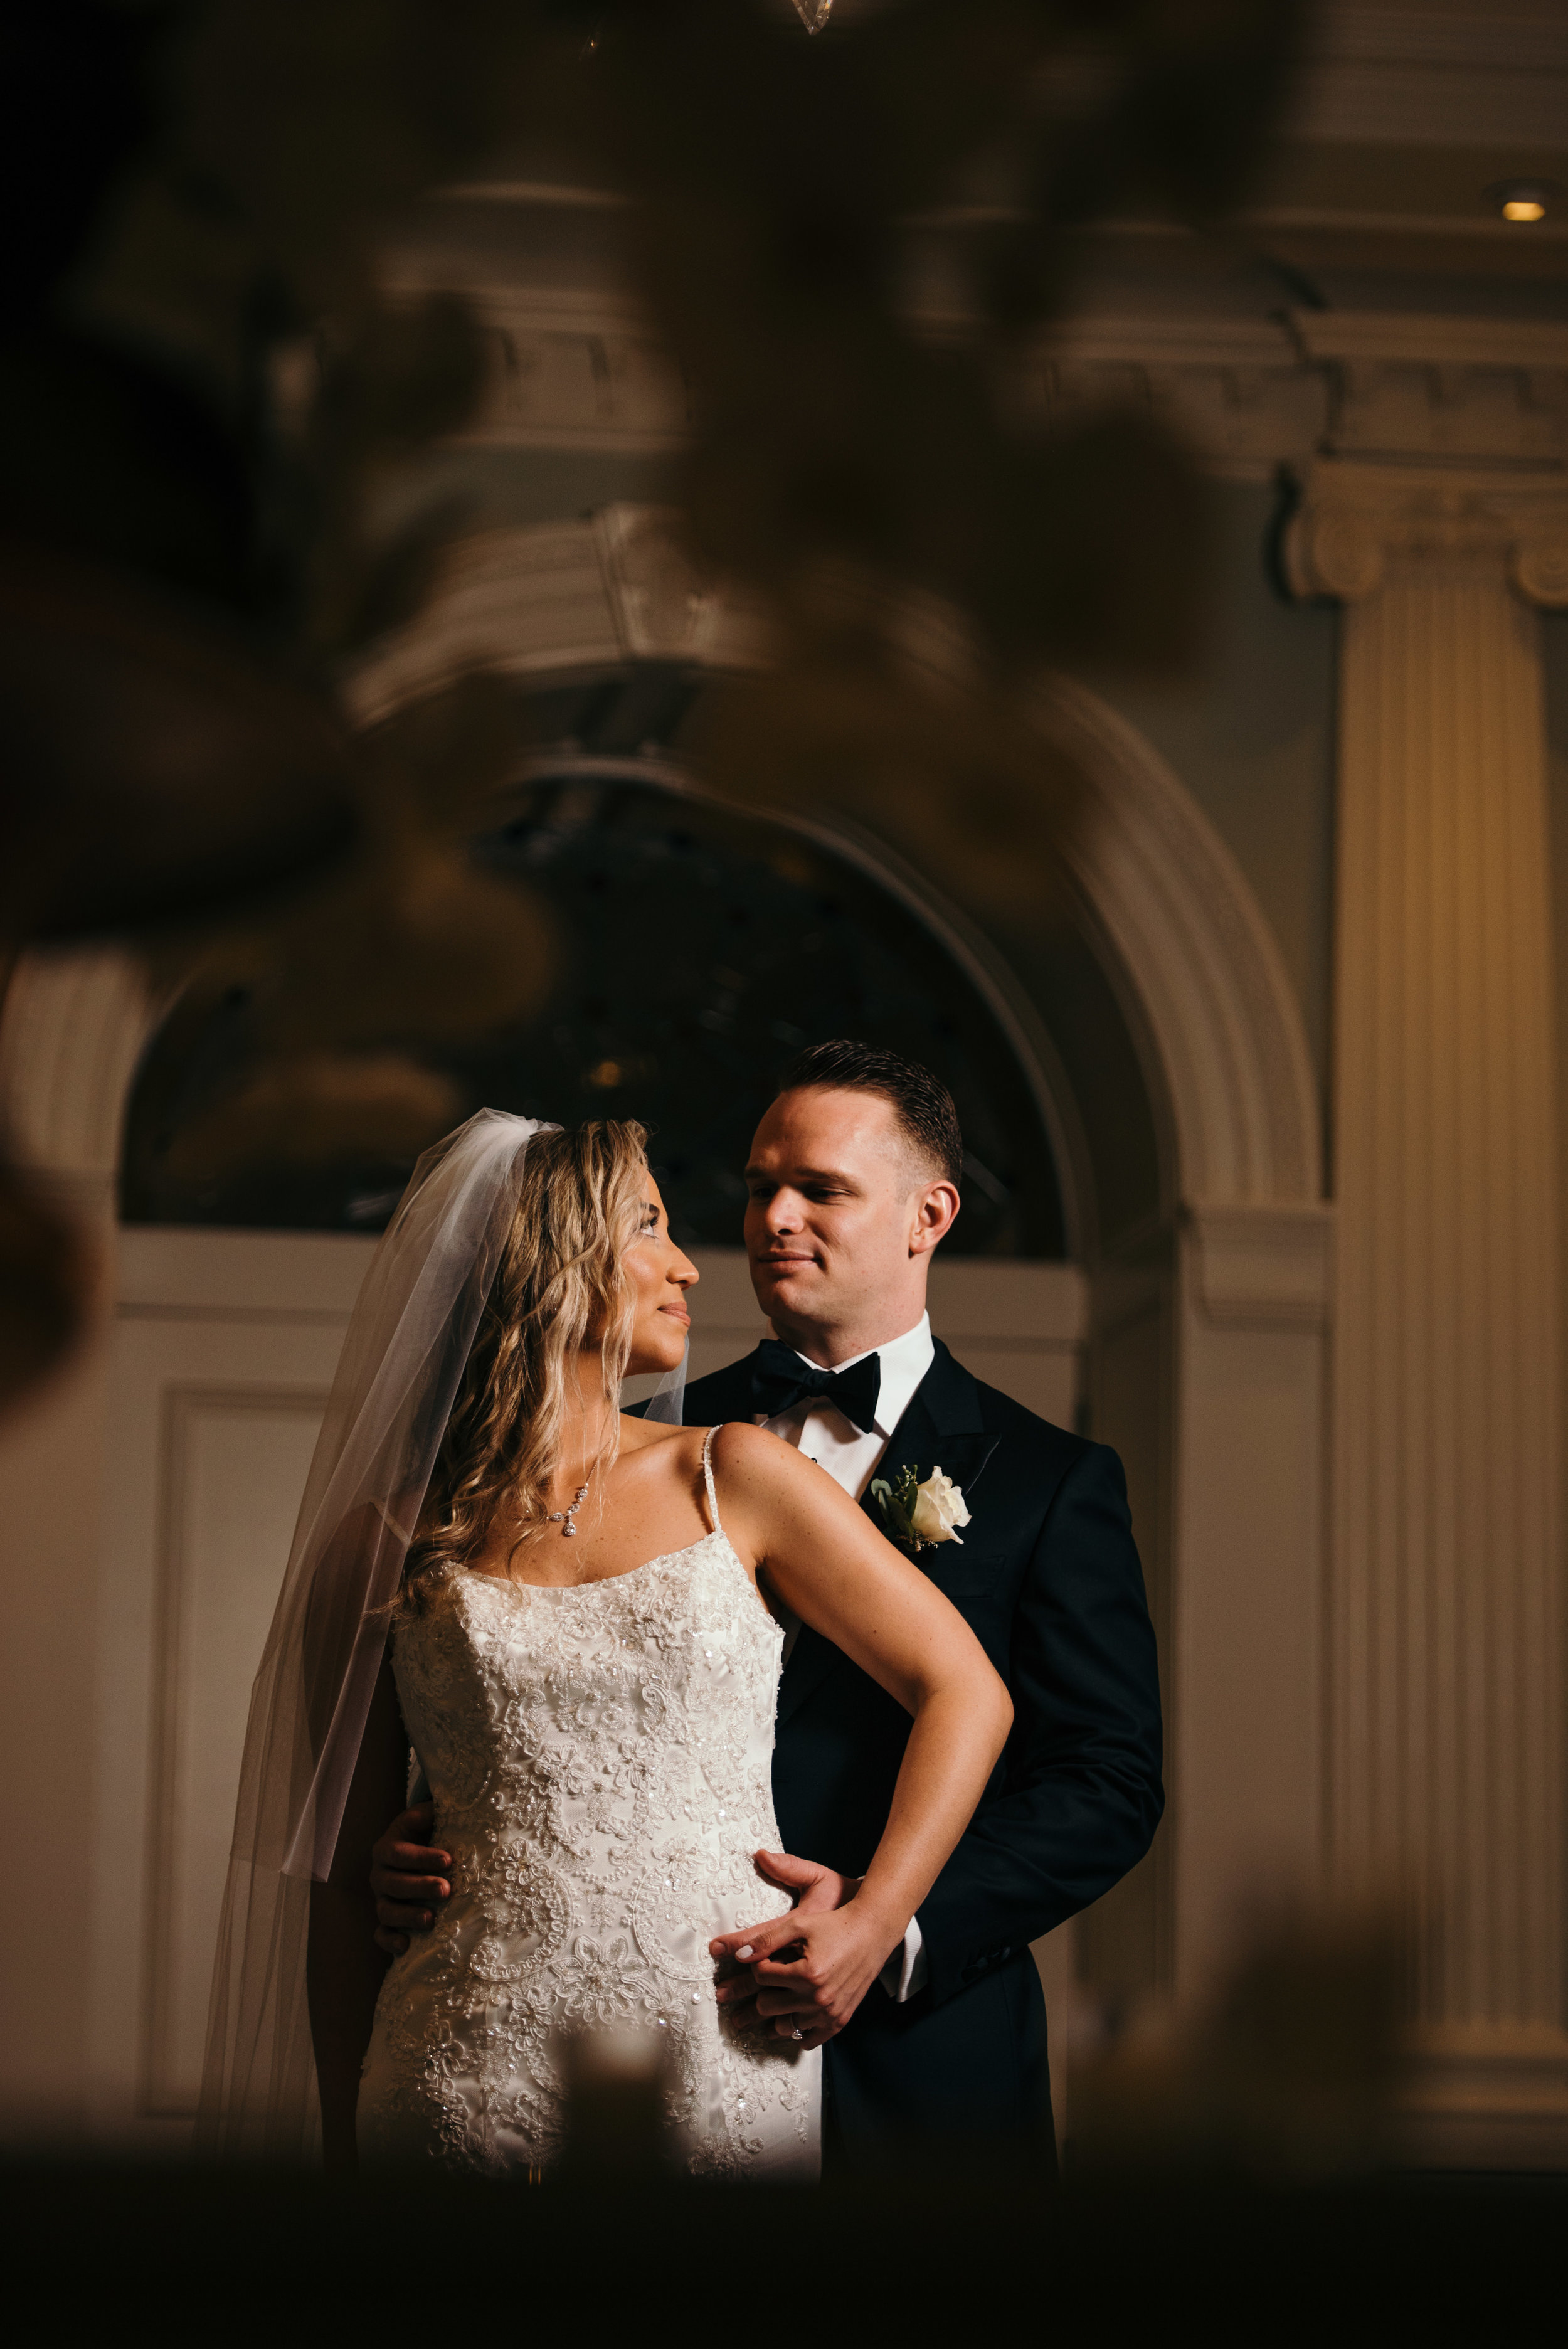 The Rockleigh Wedding NJ_46.jpg